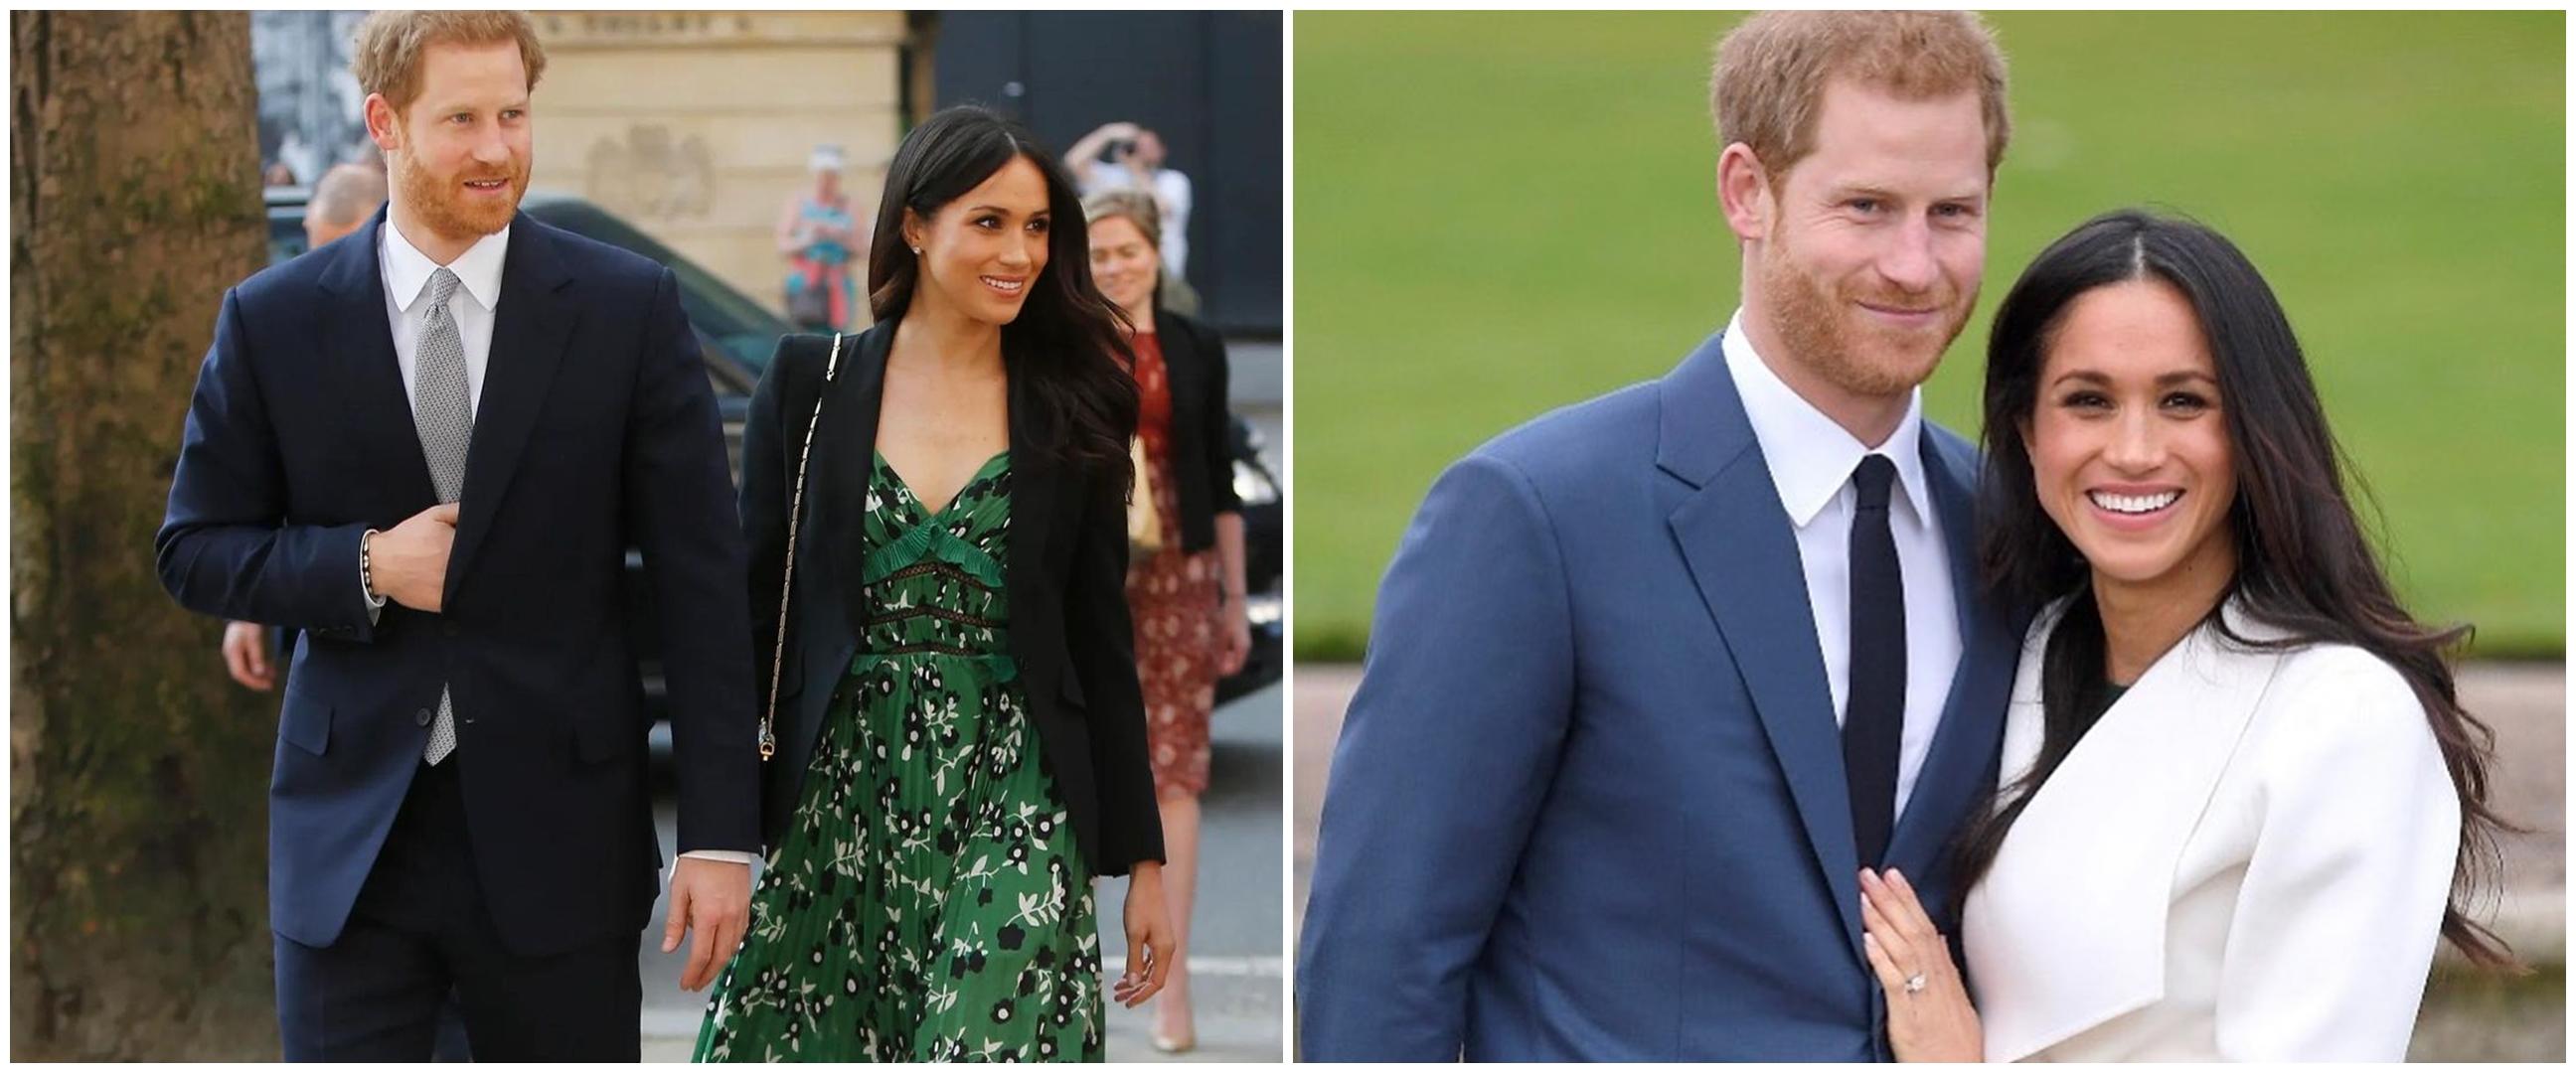 Lilibet Diana, ini arti nama anak kedua Meghan Markle & Pangeran Harry